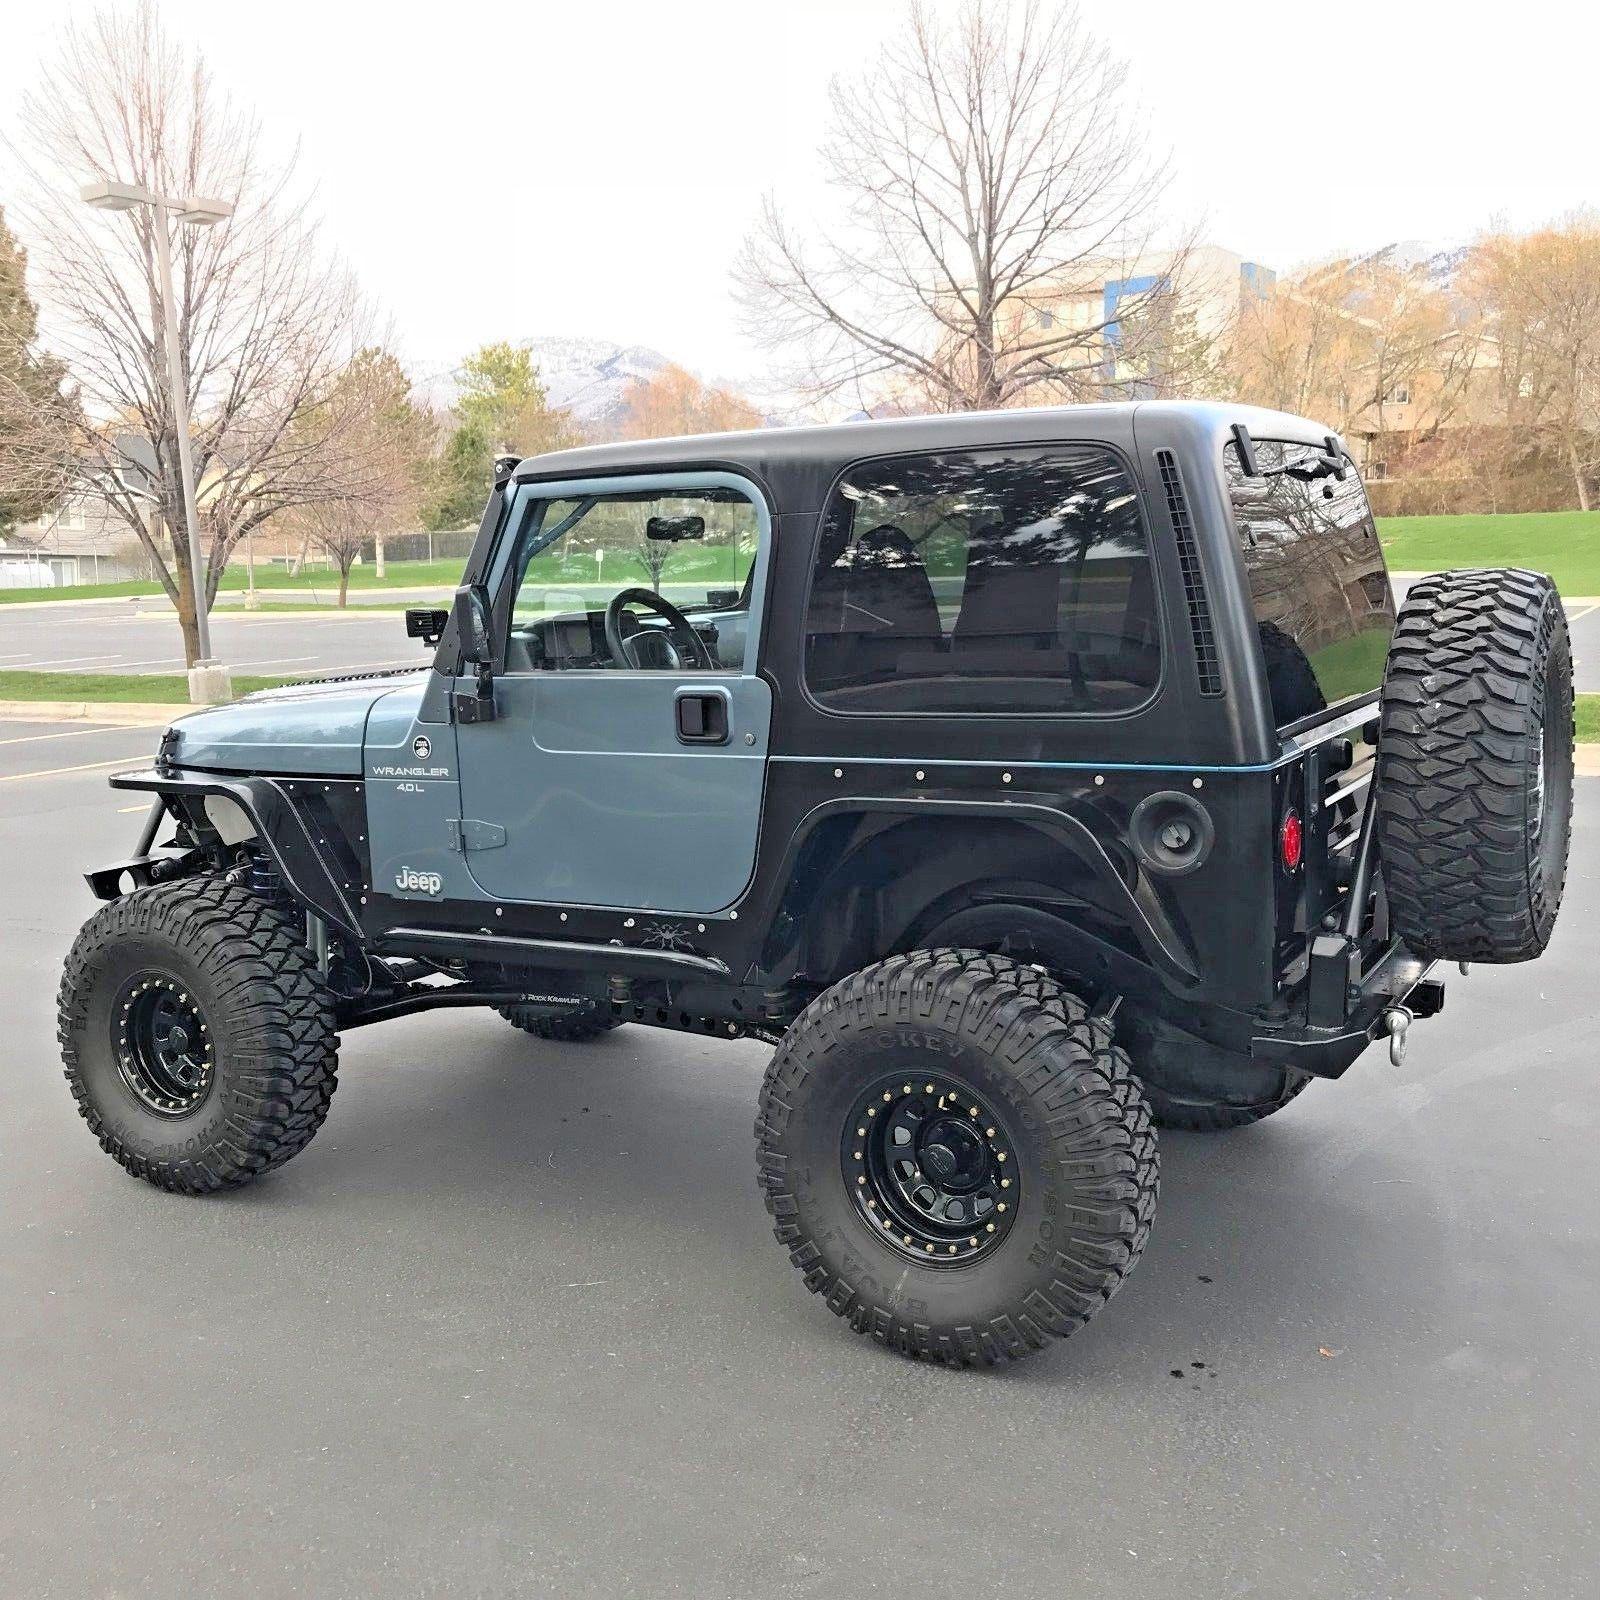 Awesomeamazinggreat Jeep Wrangler Sport Lifted Jeep Wrangler Tj Sport Door L I X Fully Built Rock Crawler